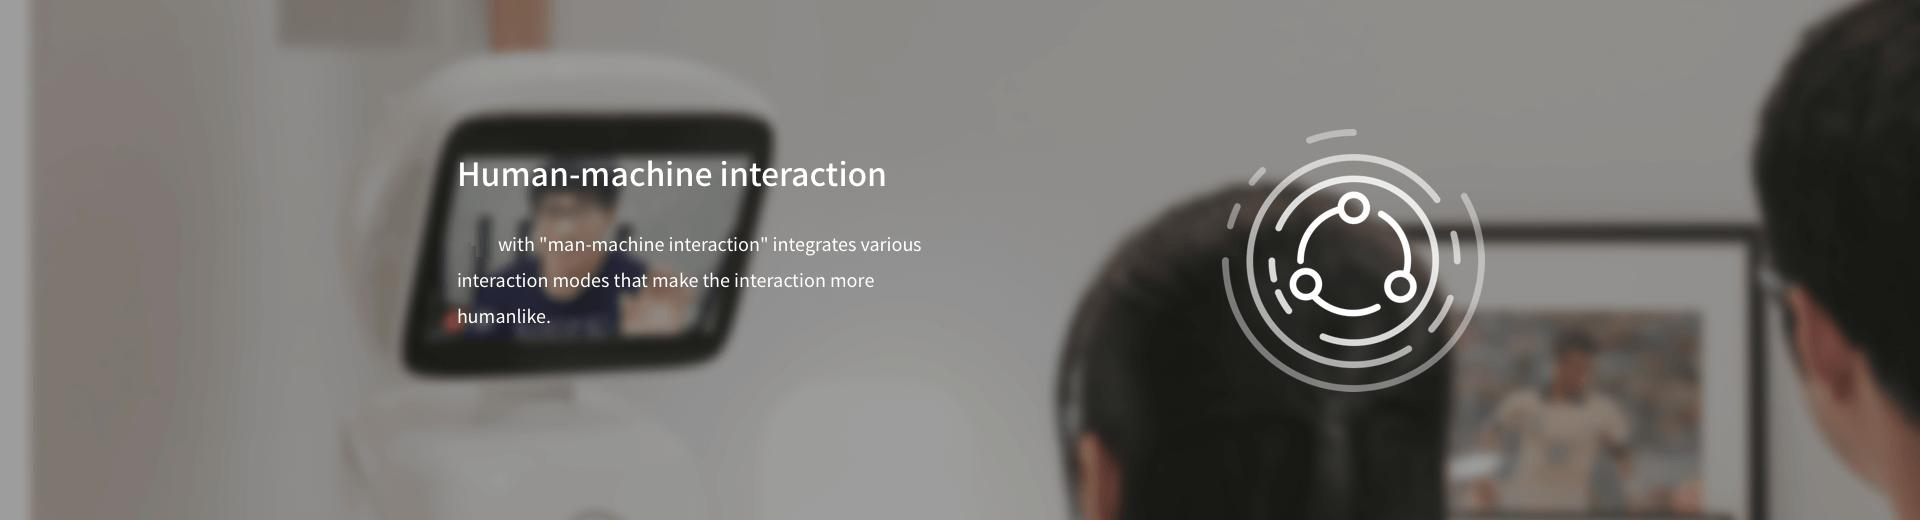 Human interaction SIFROBOT-1.0